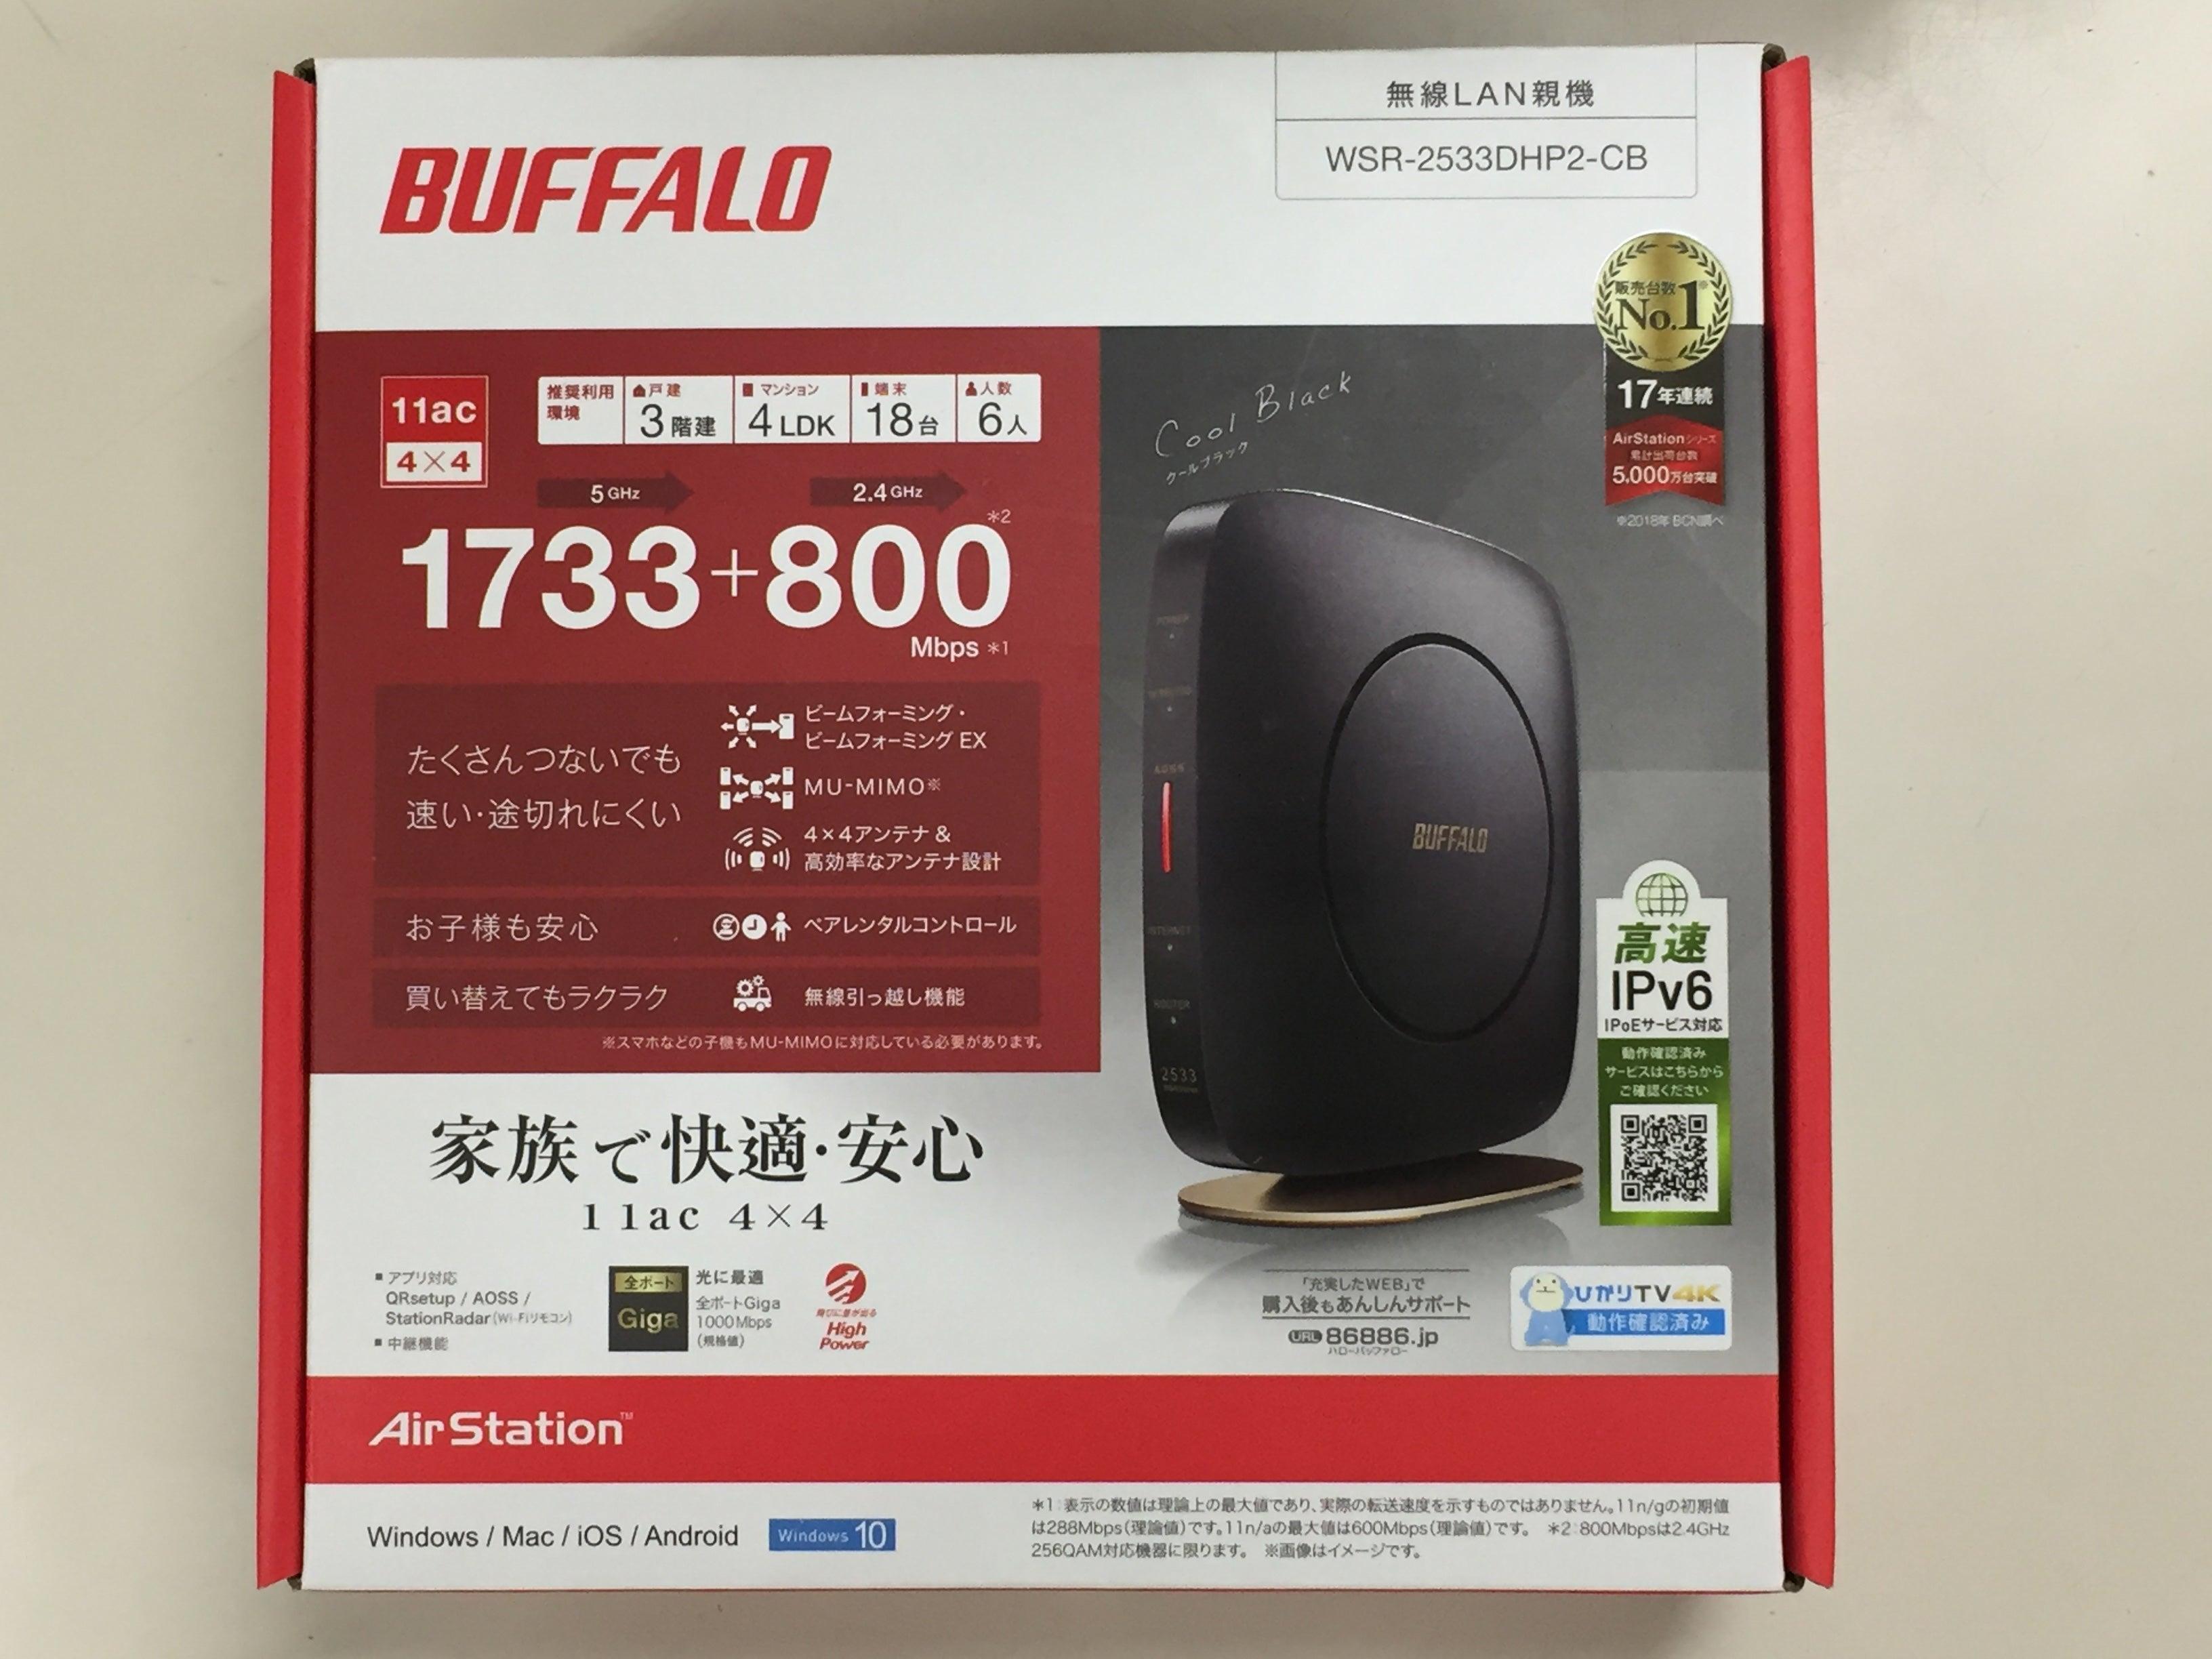 Wsr-2533dhp2 buffalo